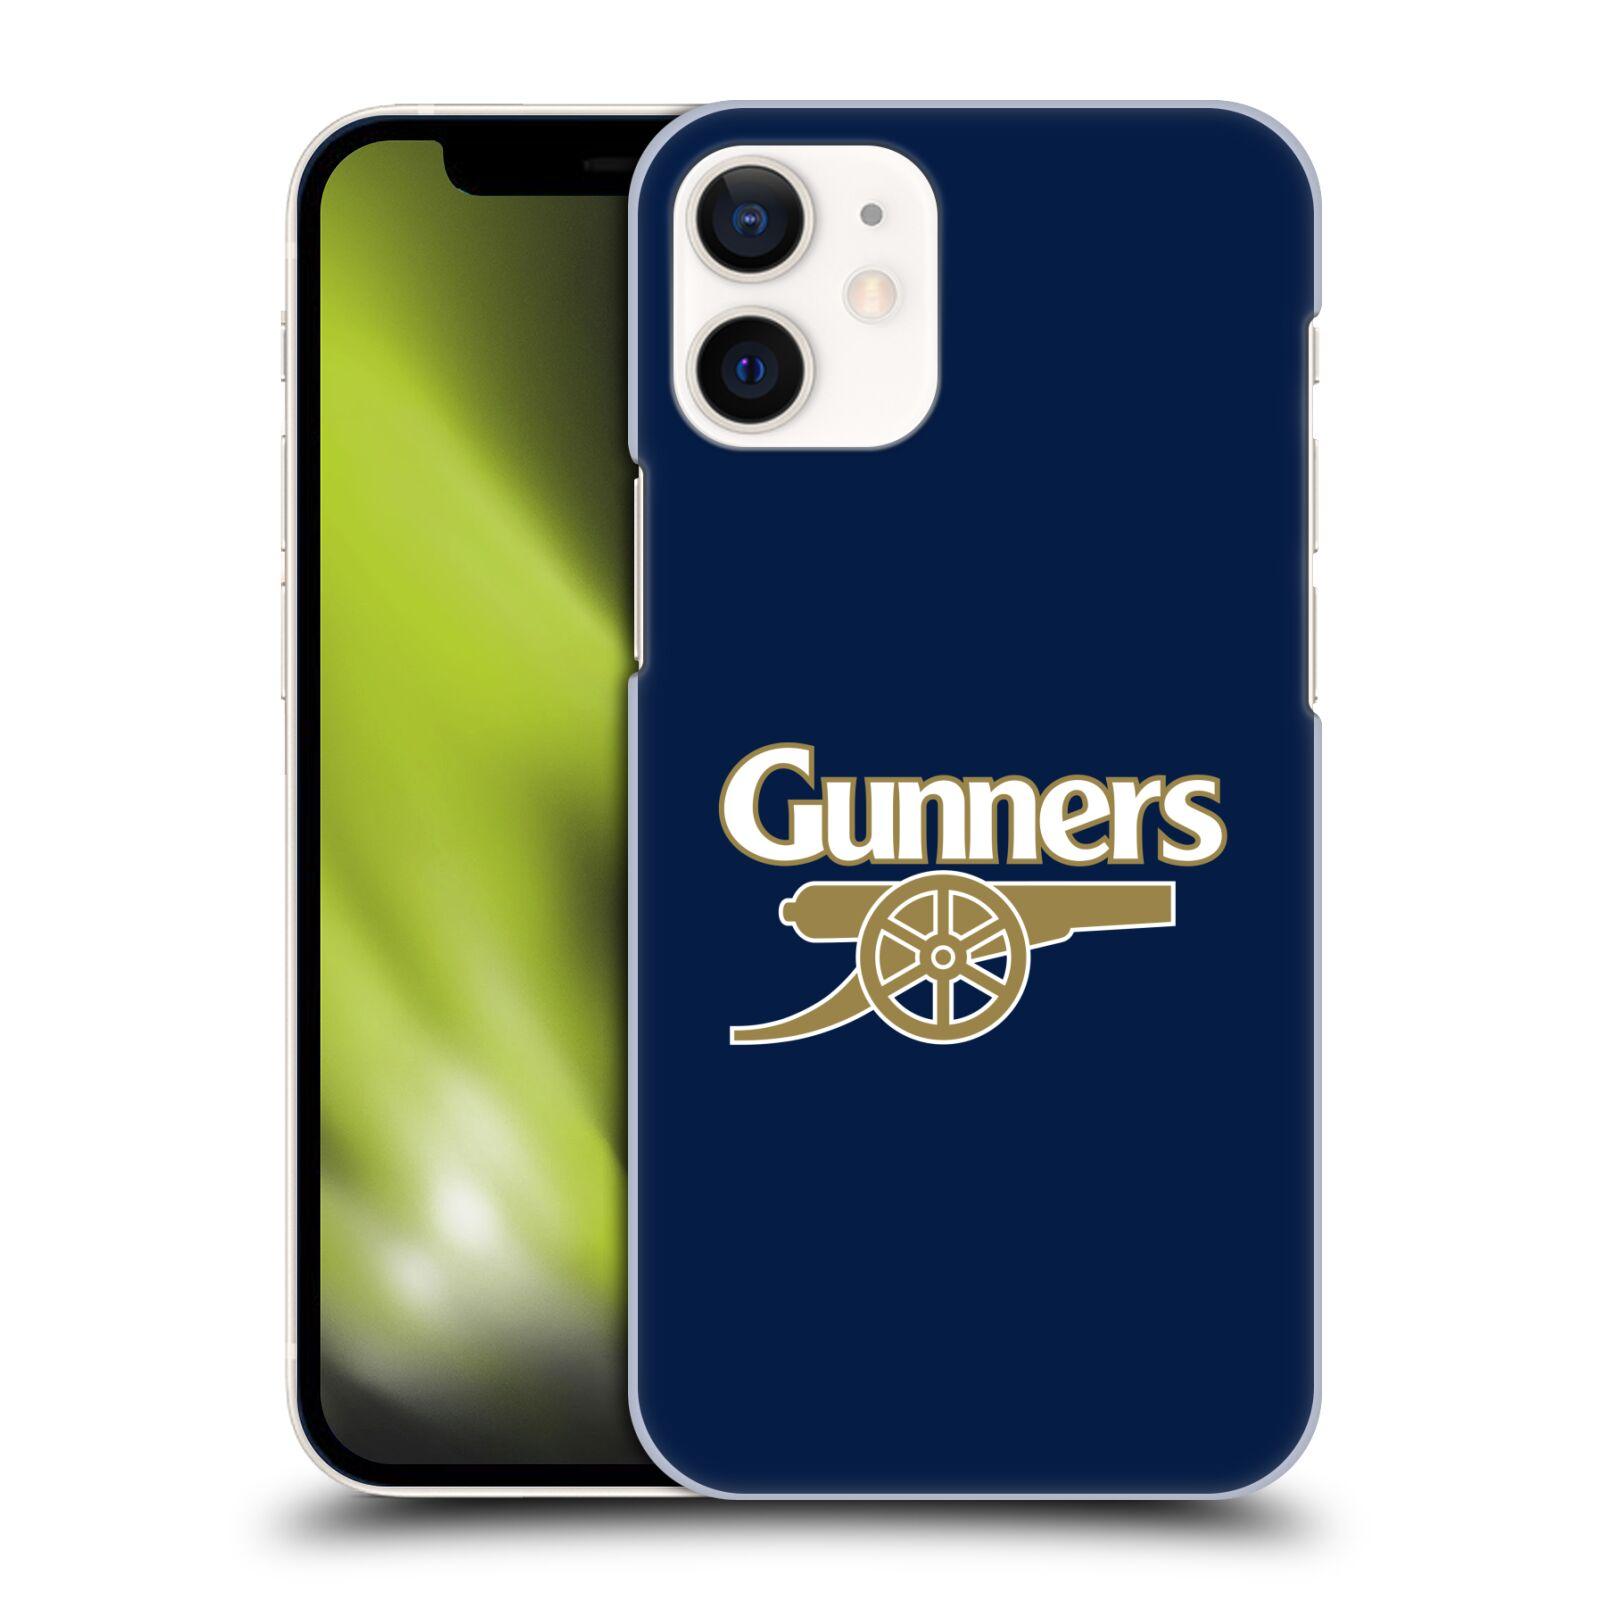 Plastové pouzdro na mobil Apple iPhone 12 Mini - Head Case - Arsenal FC - Gunners